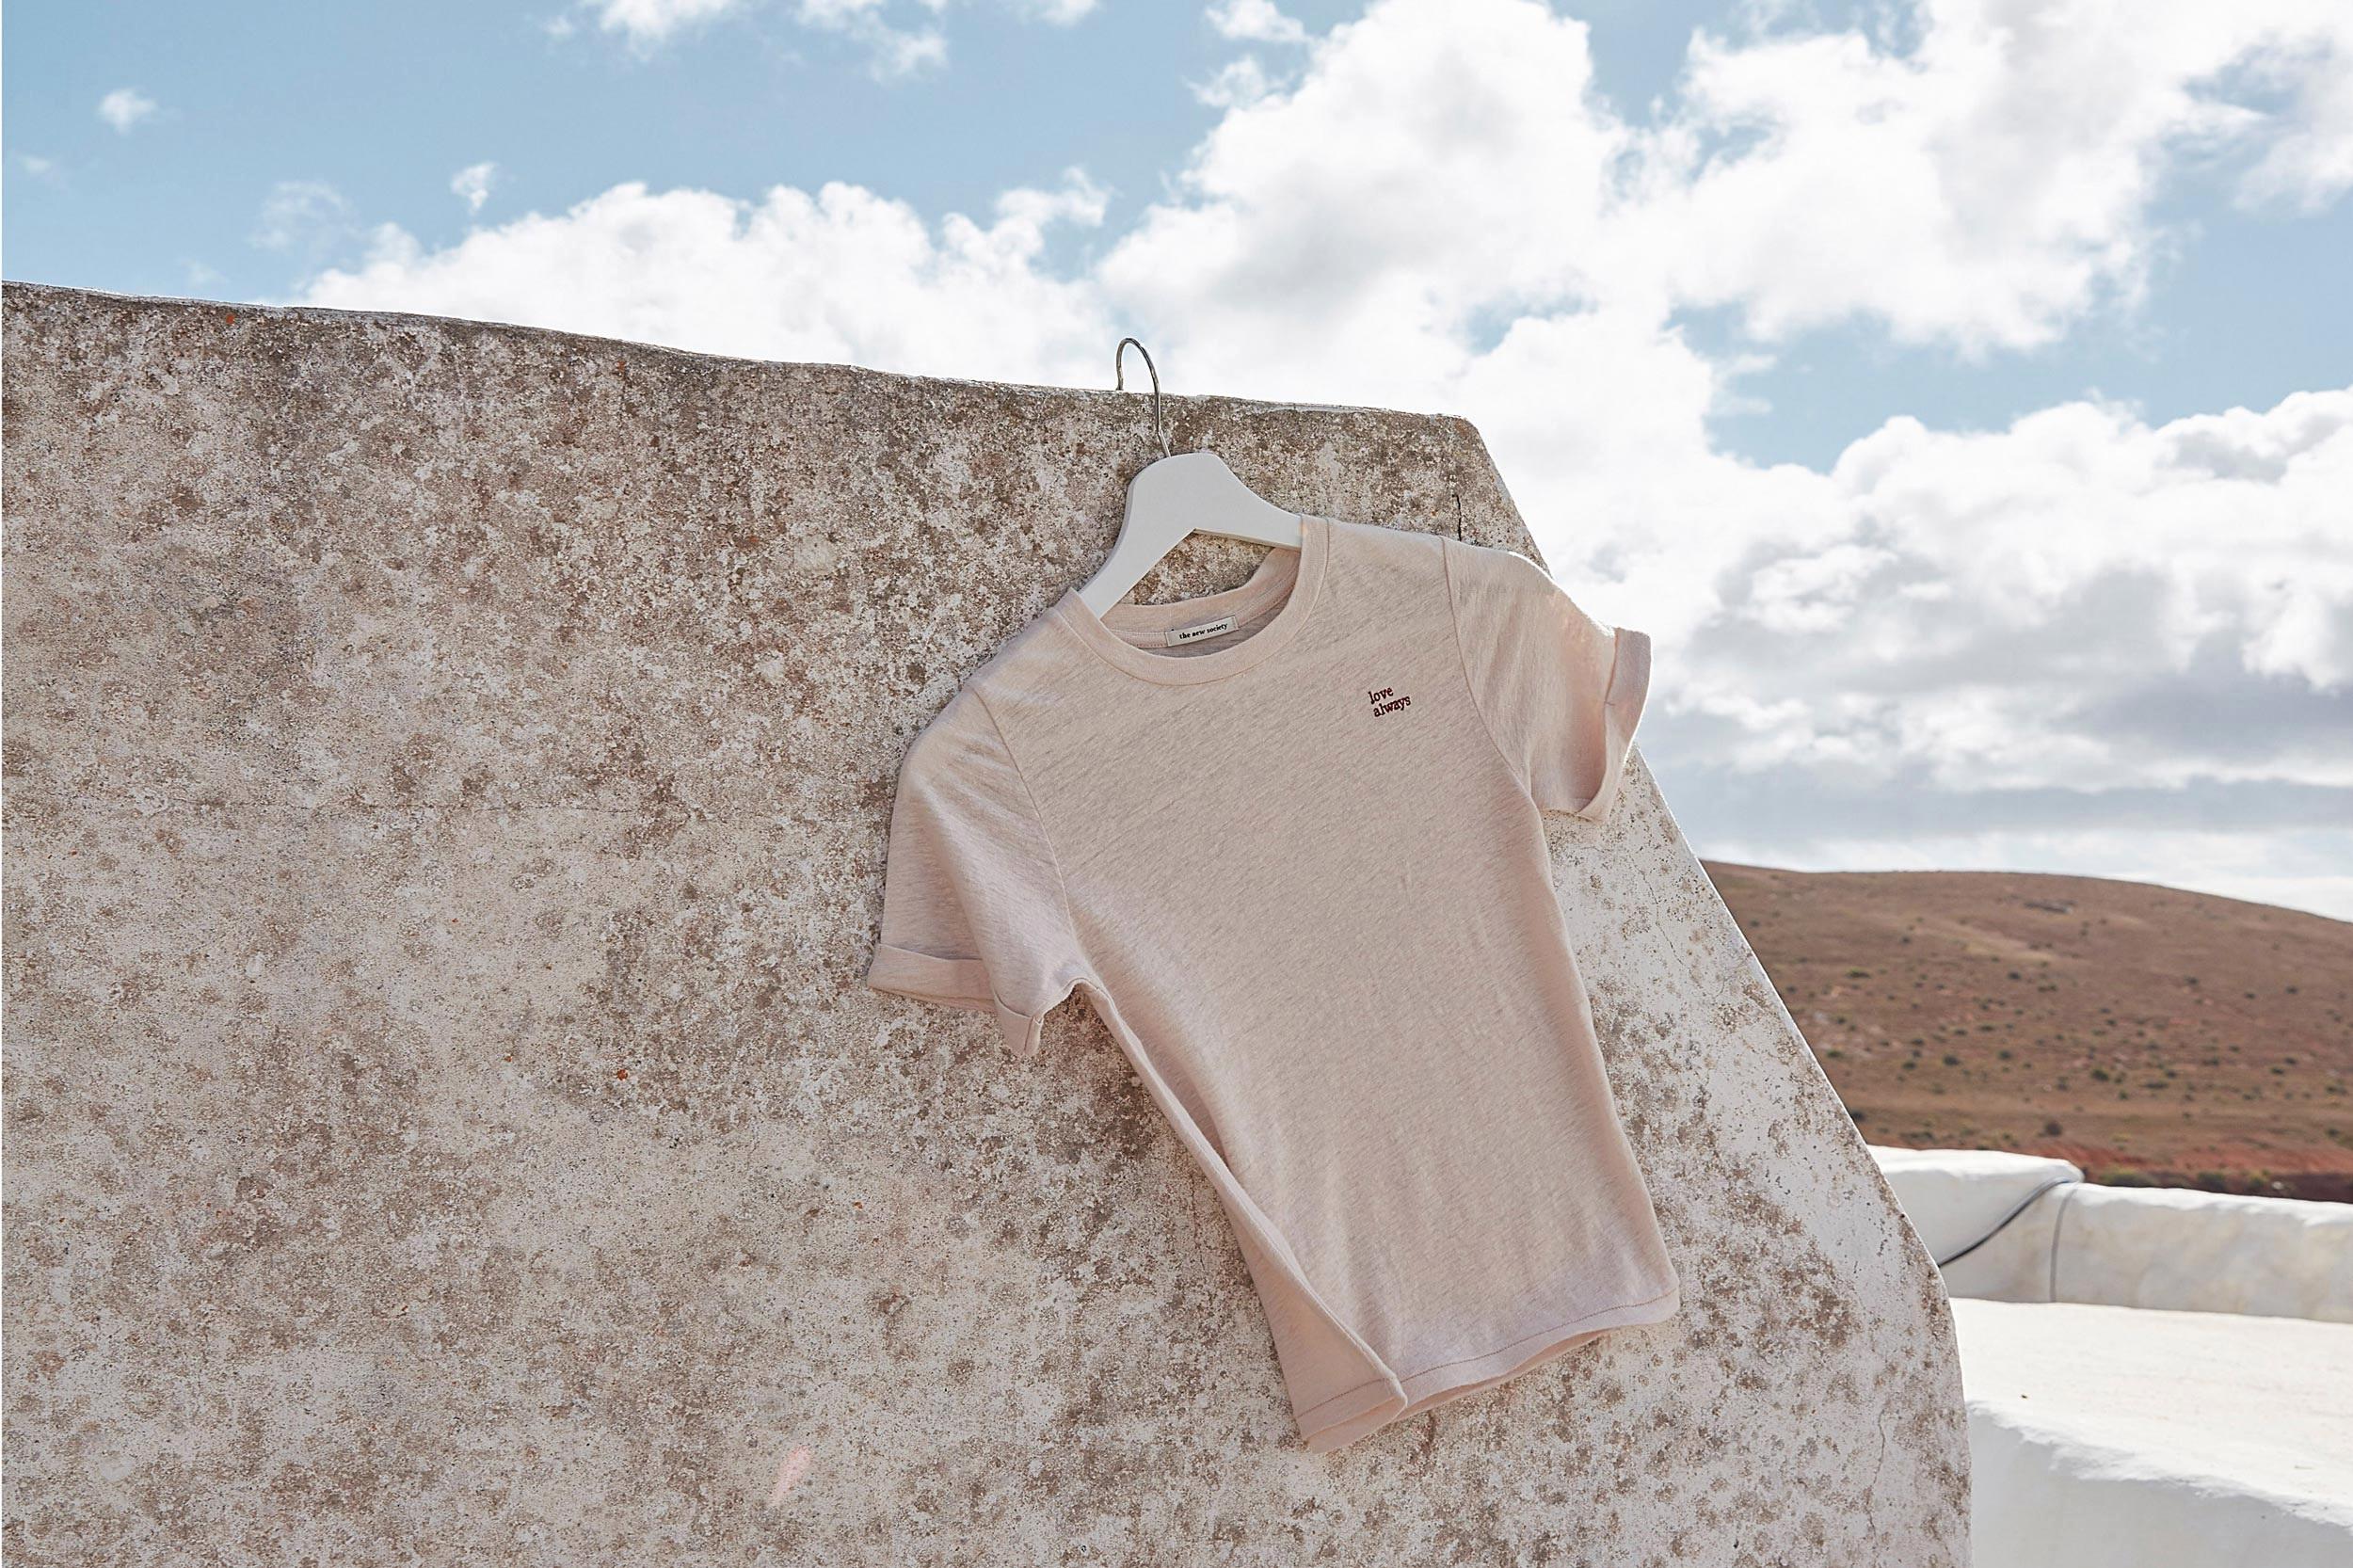 12_Lanzarote_THENEWSOCIETY_Tshirt_006_srgb_breiter_3x2.jpg